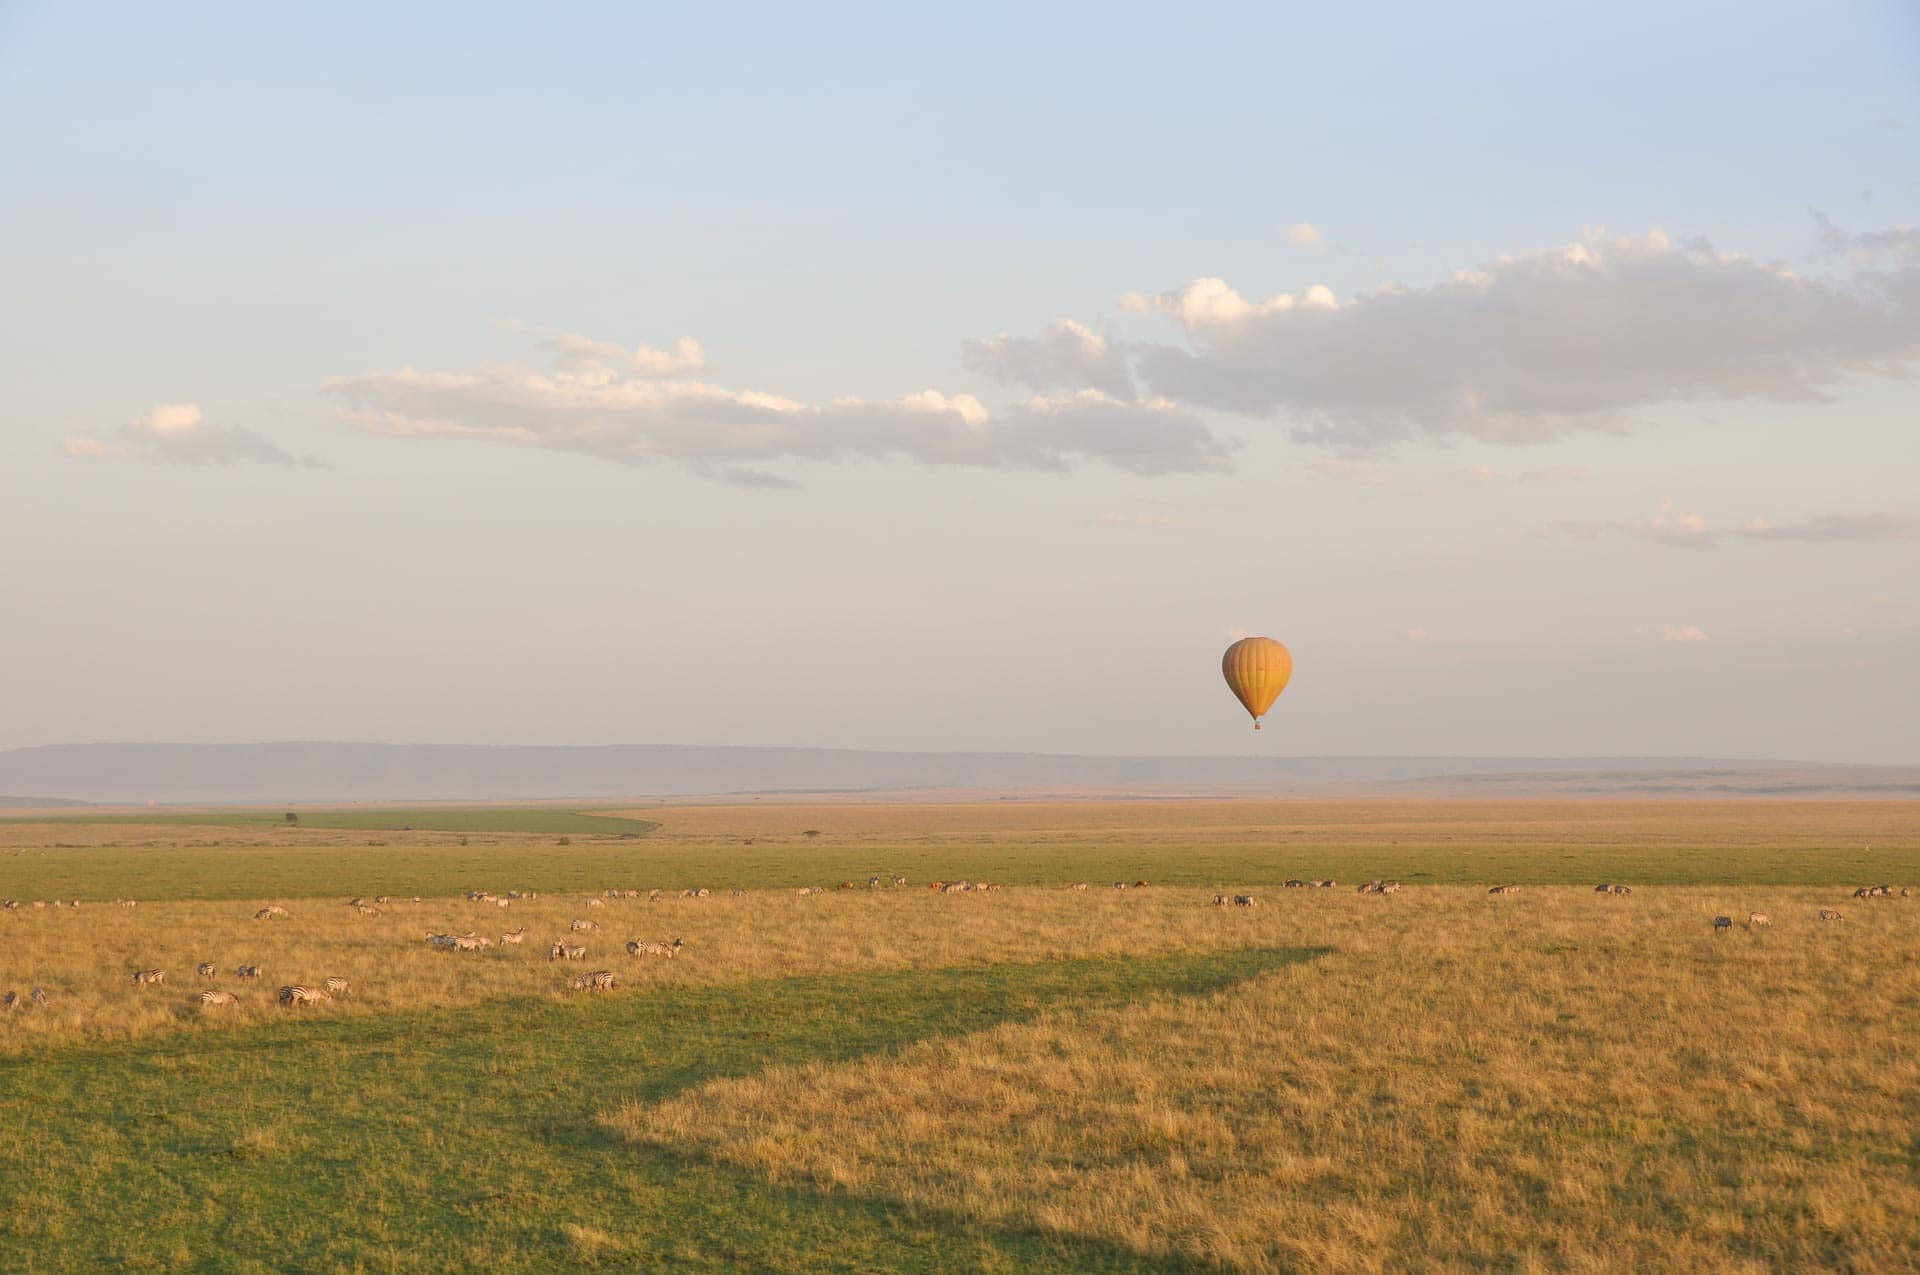 Masai-Mara-Ballonfahrt-Kenia-Globetrotter-Select-8